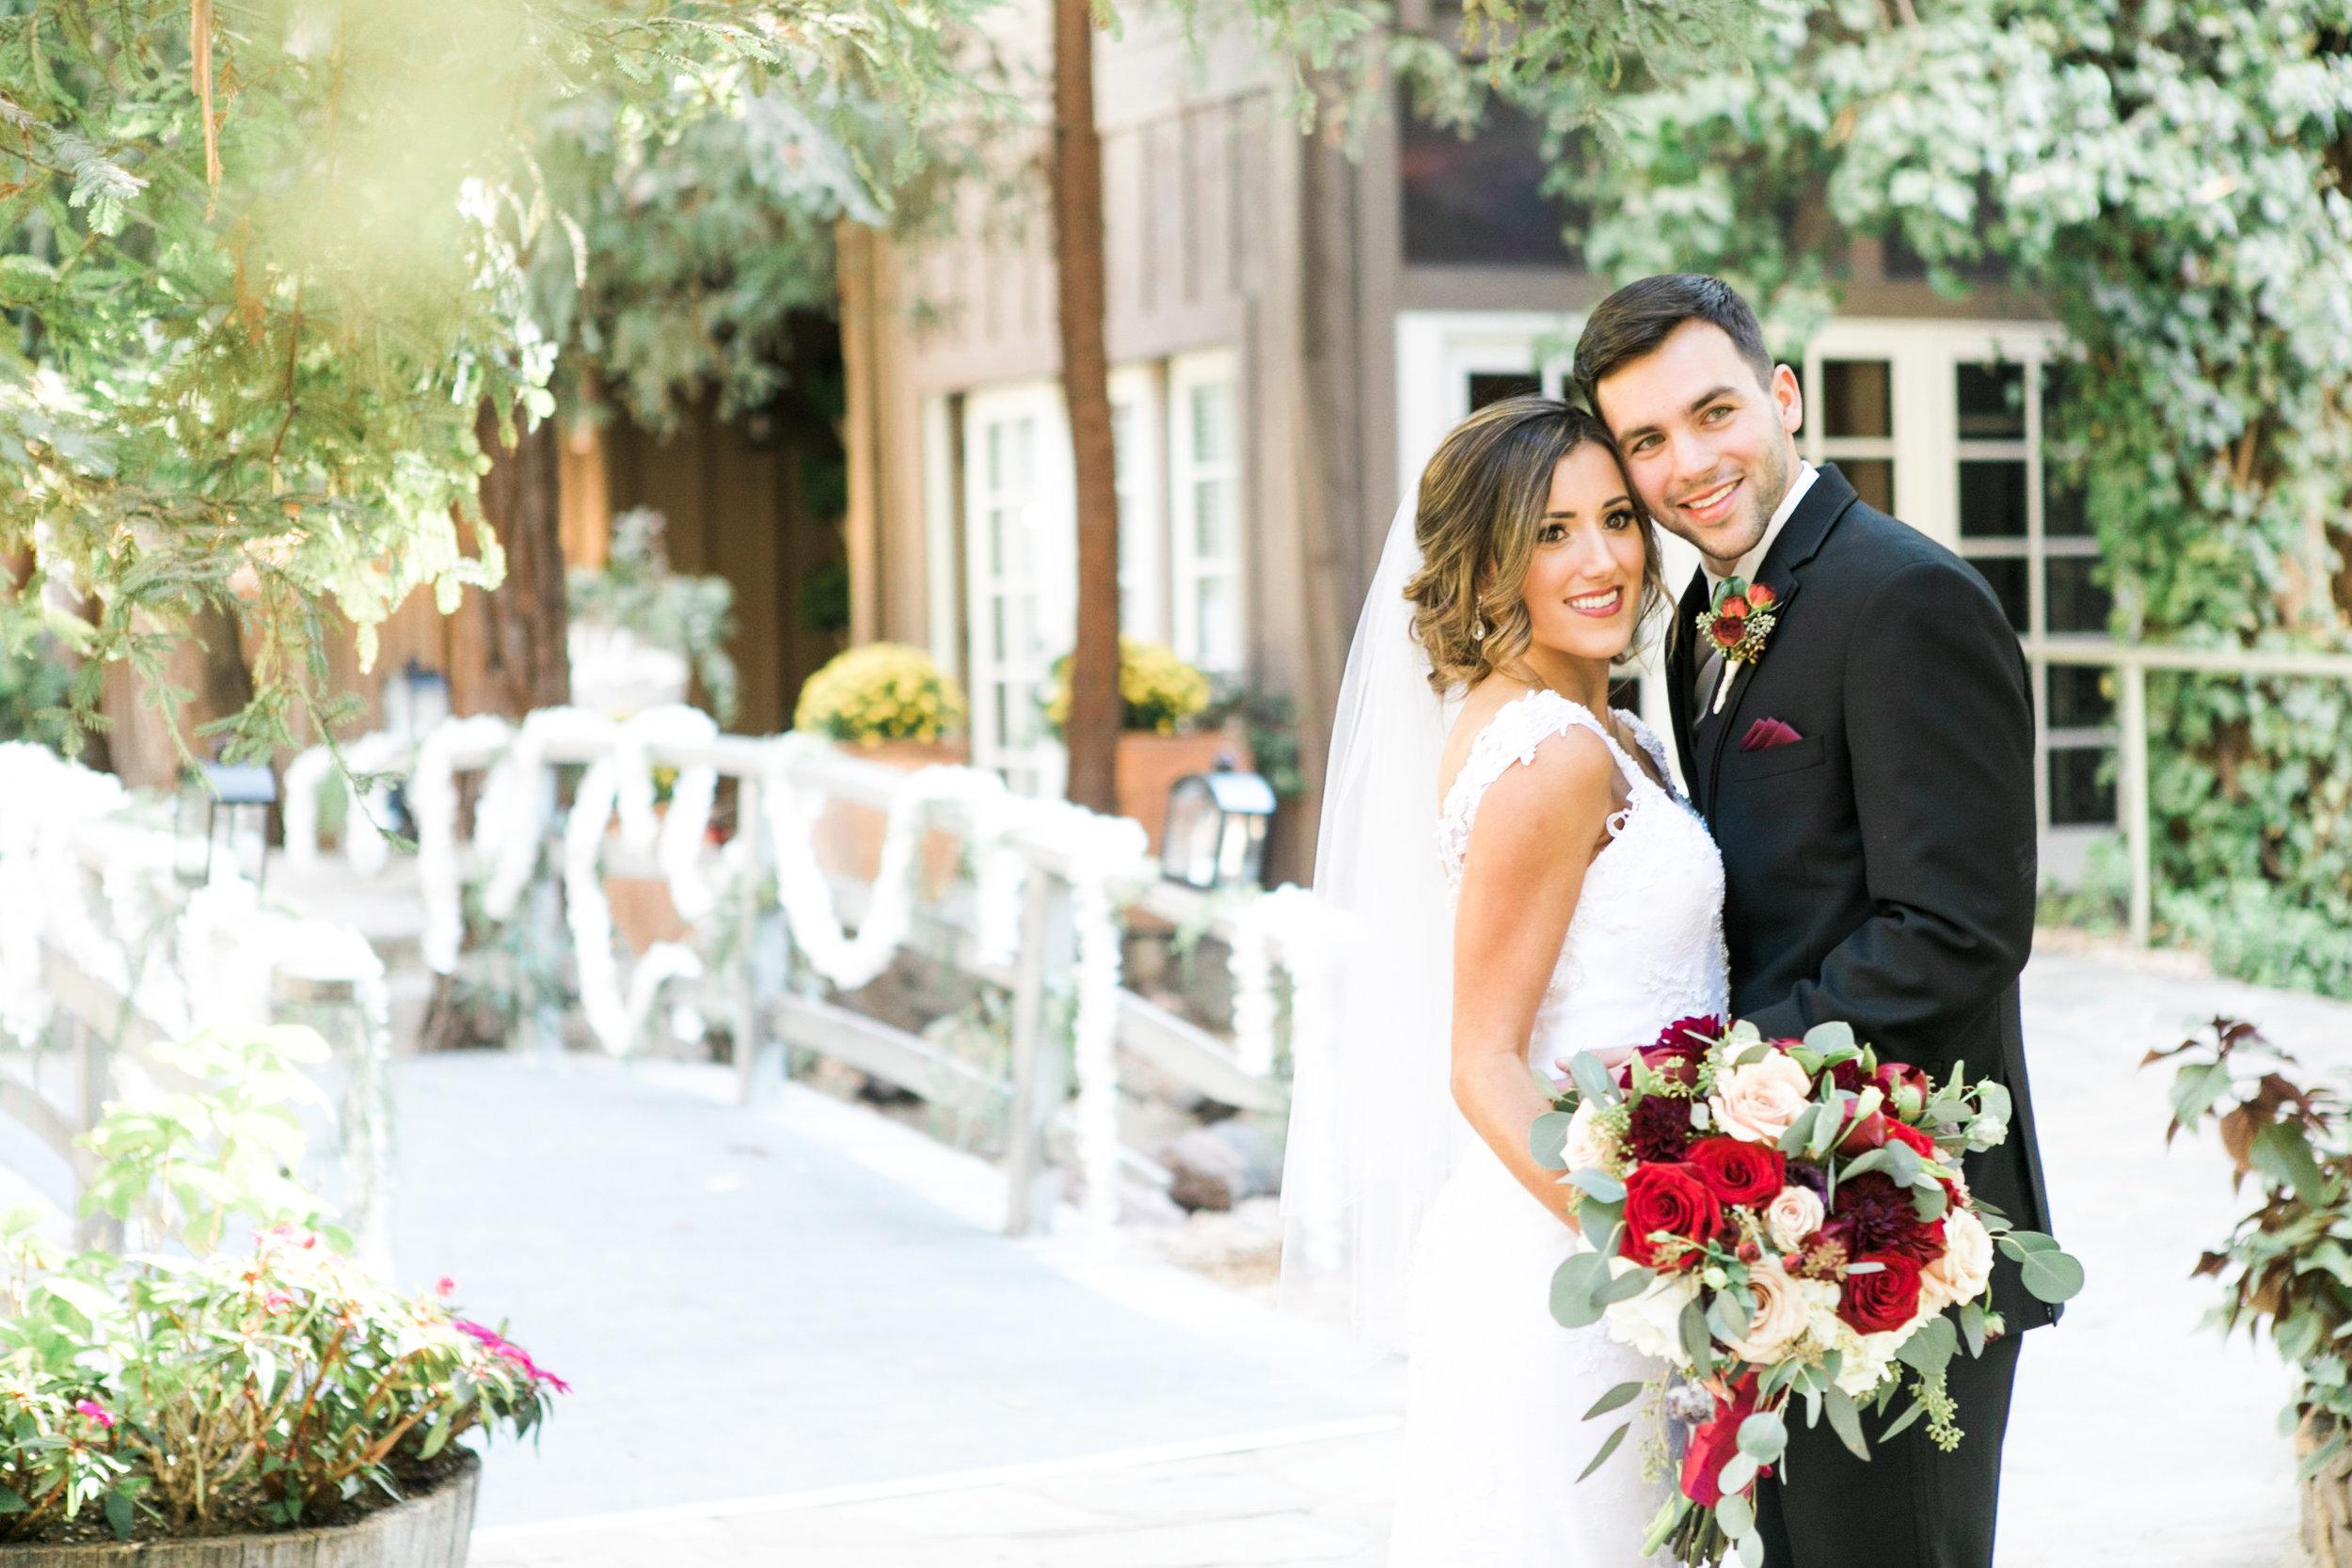 Calamigos Ranch Wedding at the Redwood Room